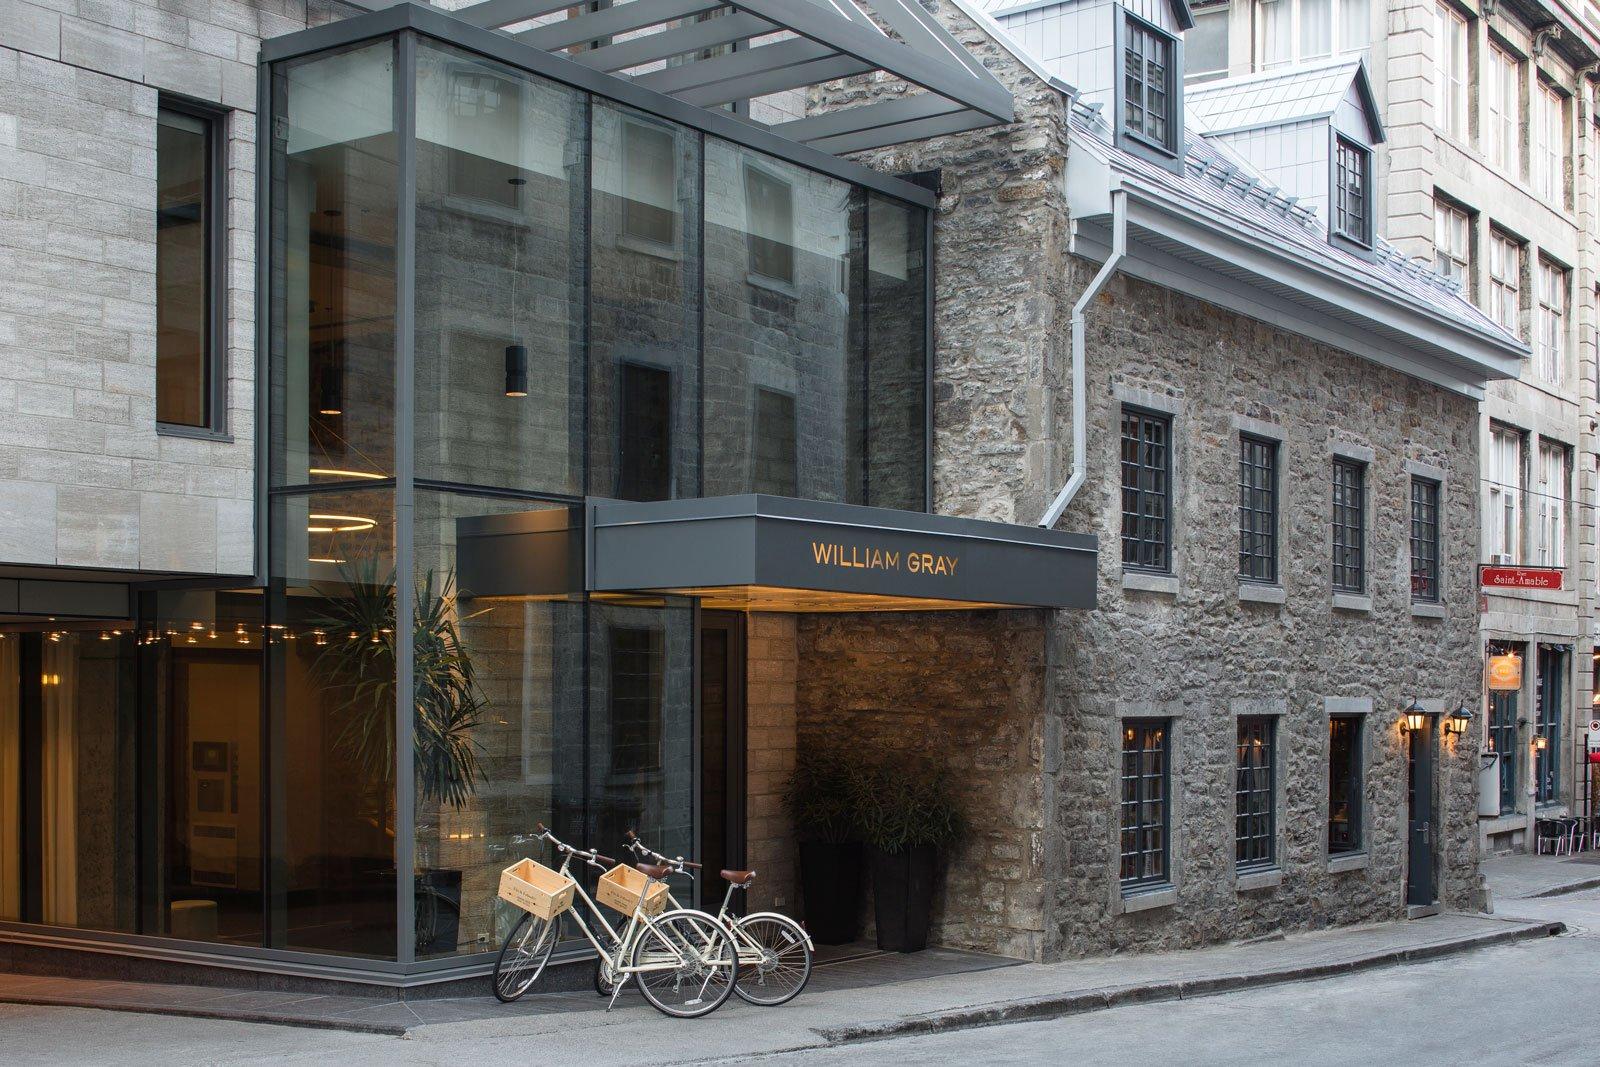 Facade extérieure de l'Hôtel William Gray